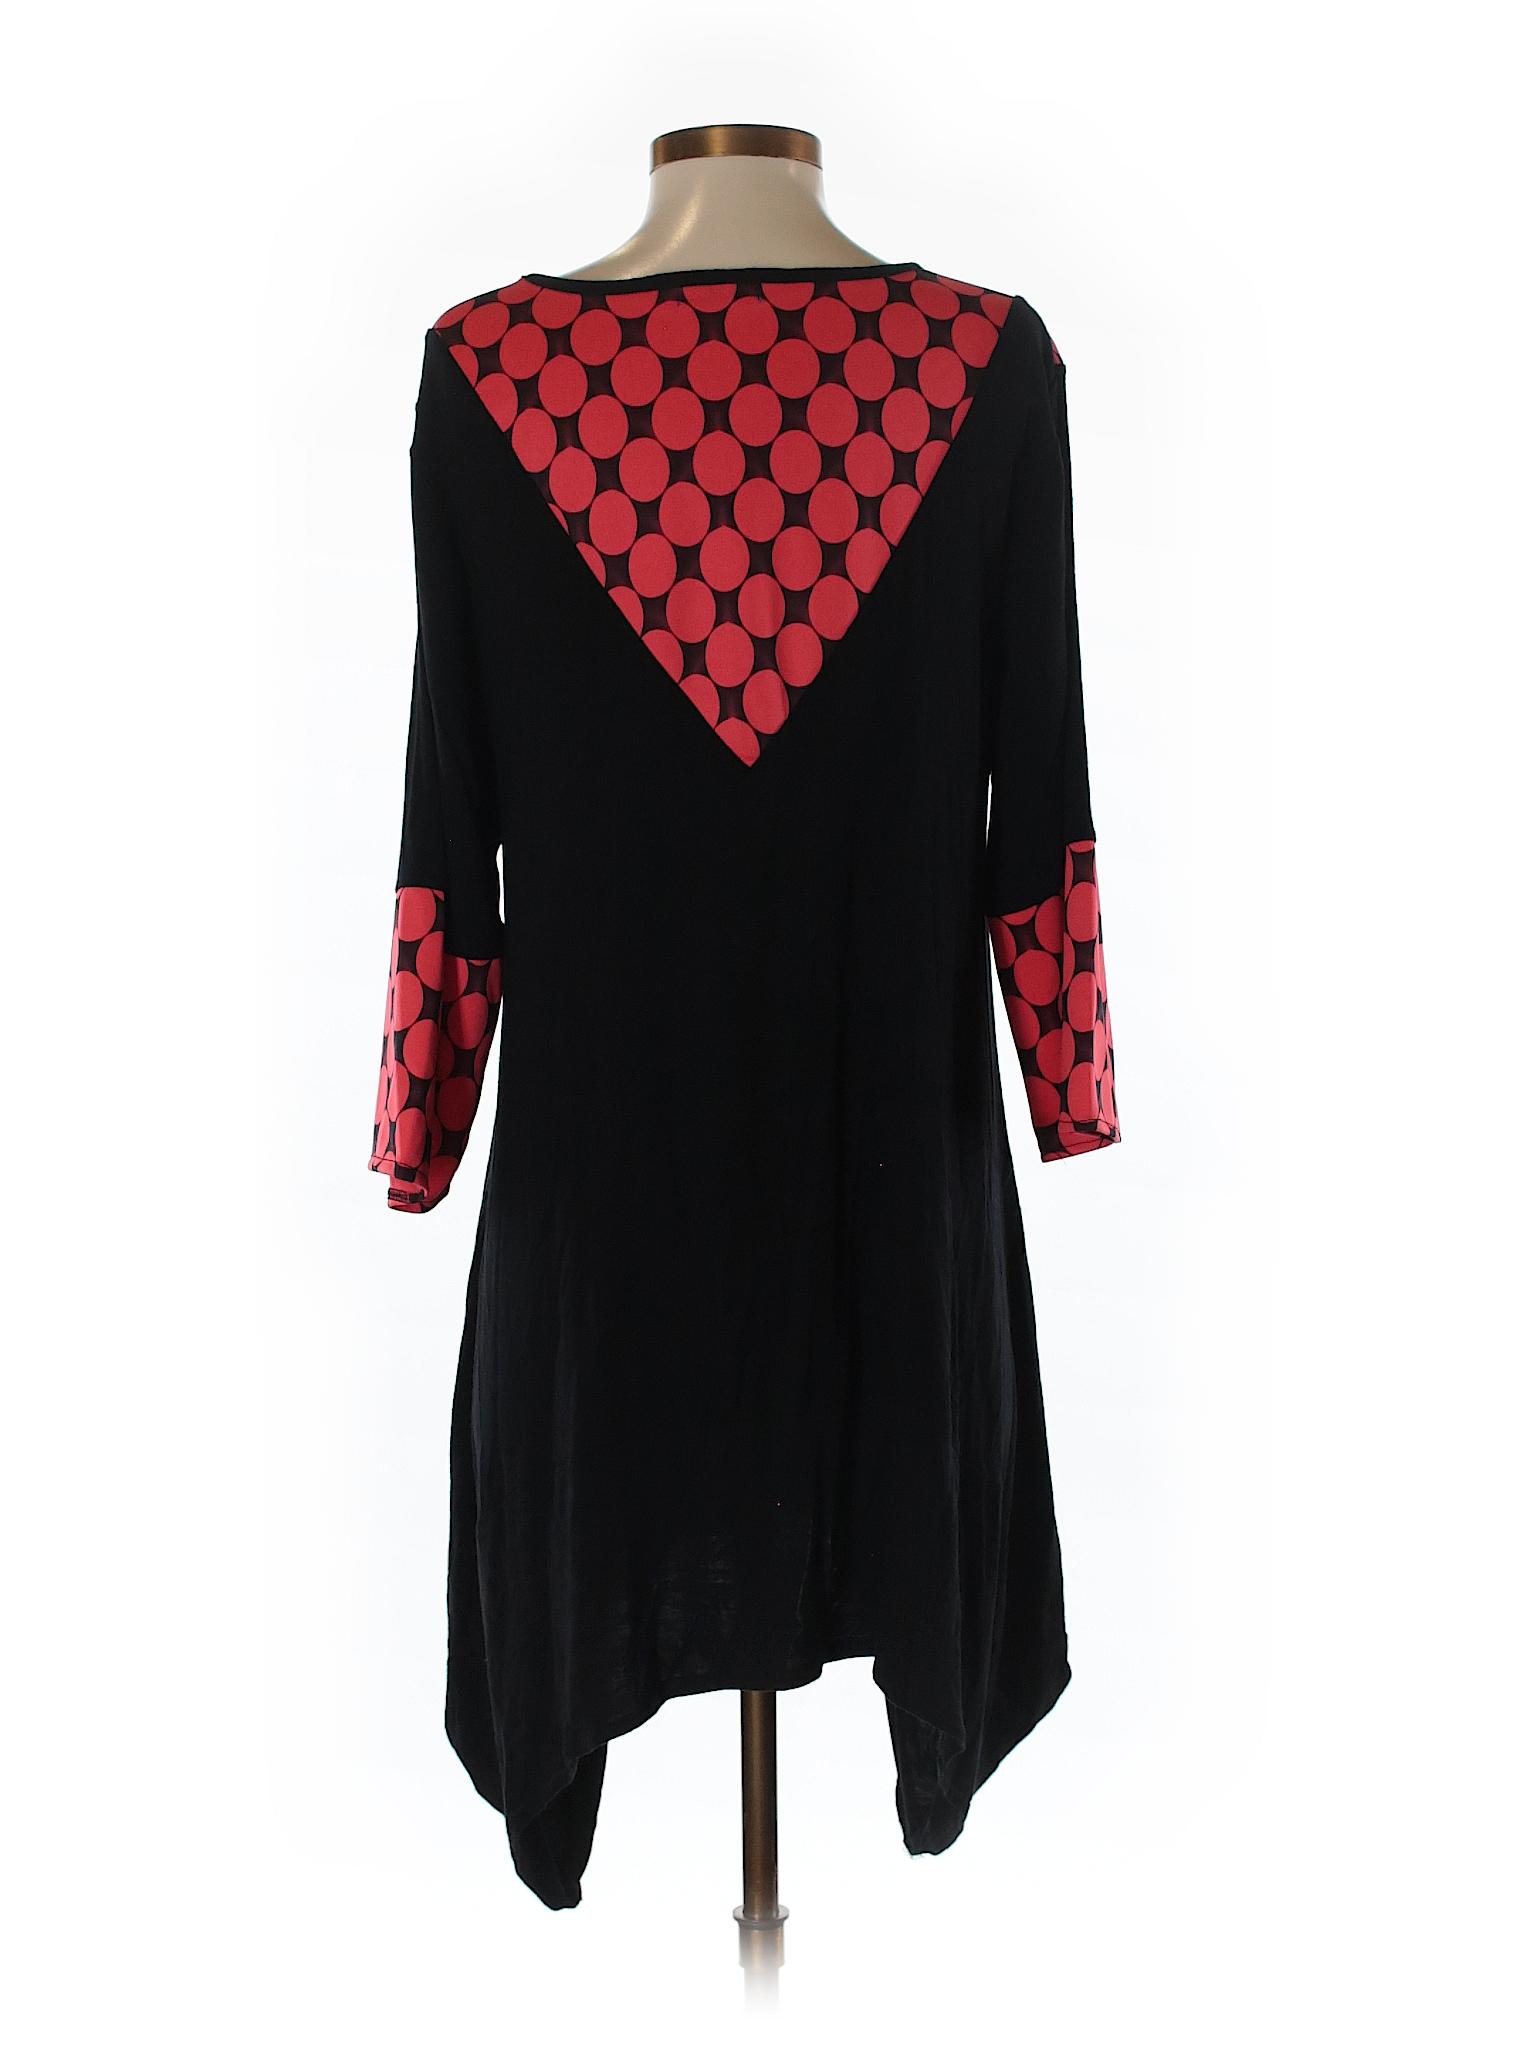 Casual Artex Casual Dress Selling Selling Artex Dress wX465z4q